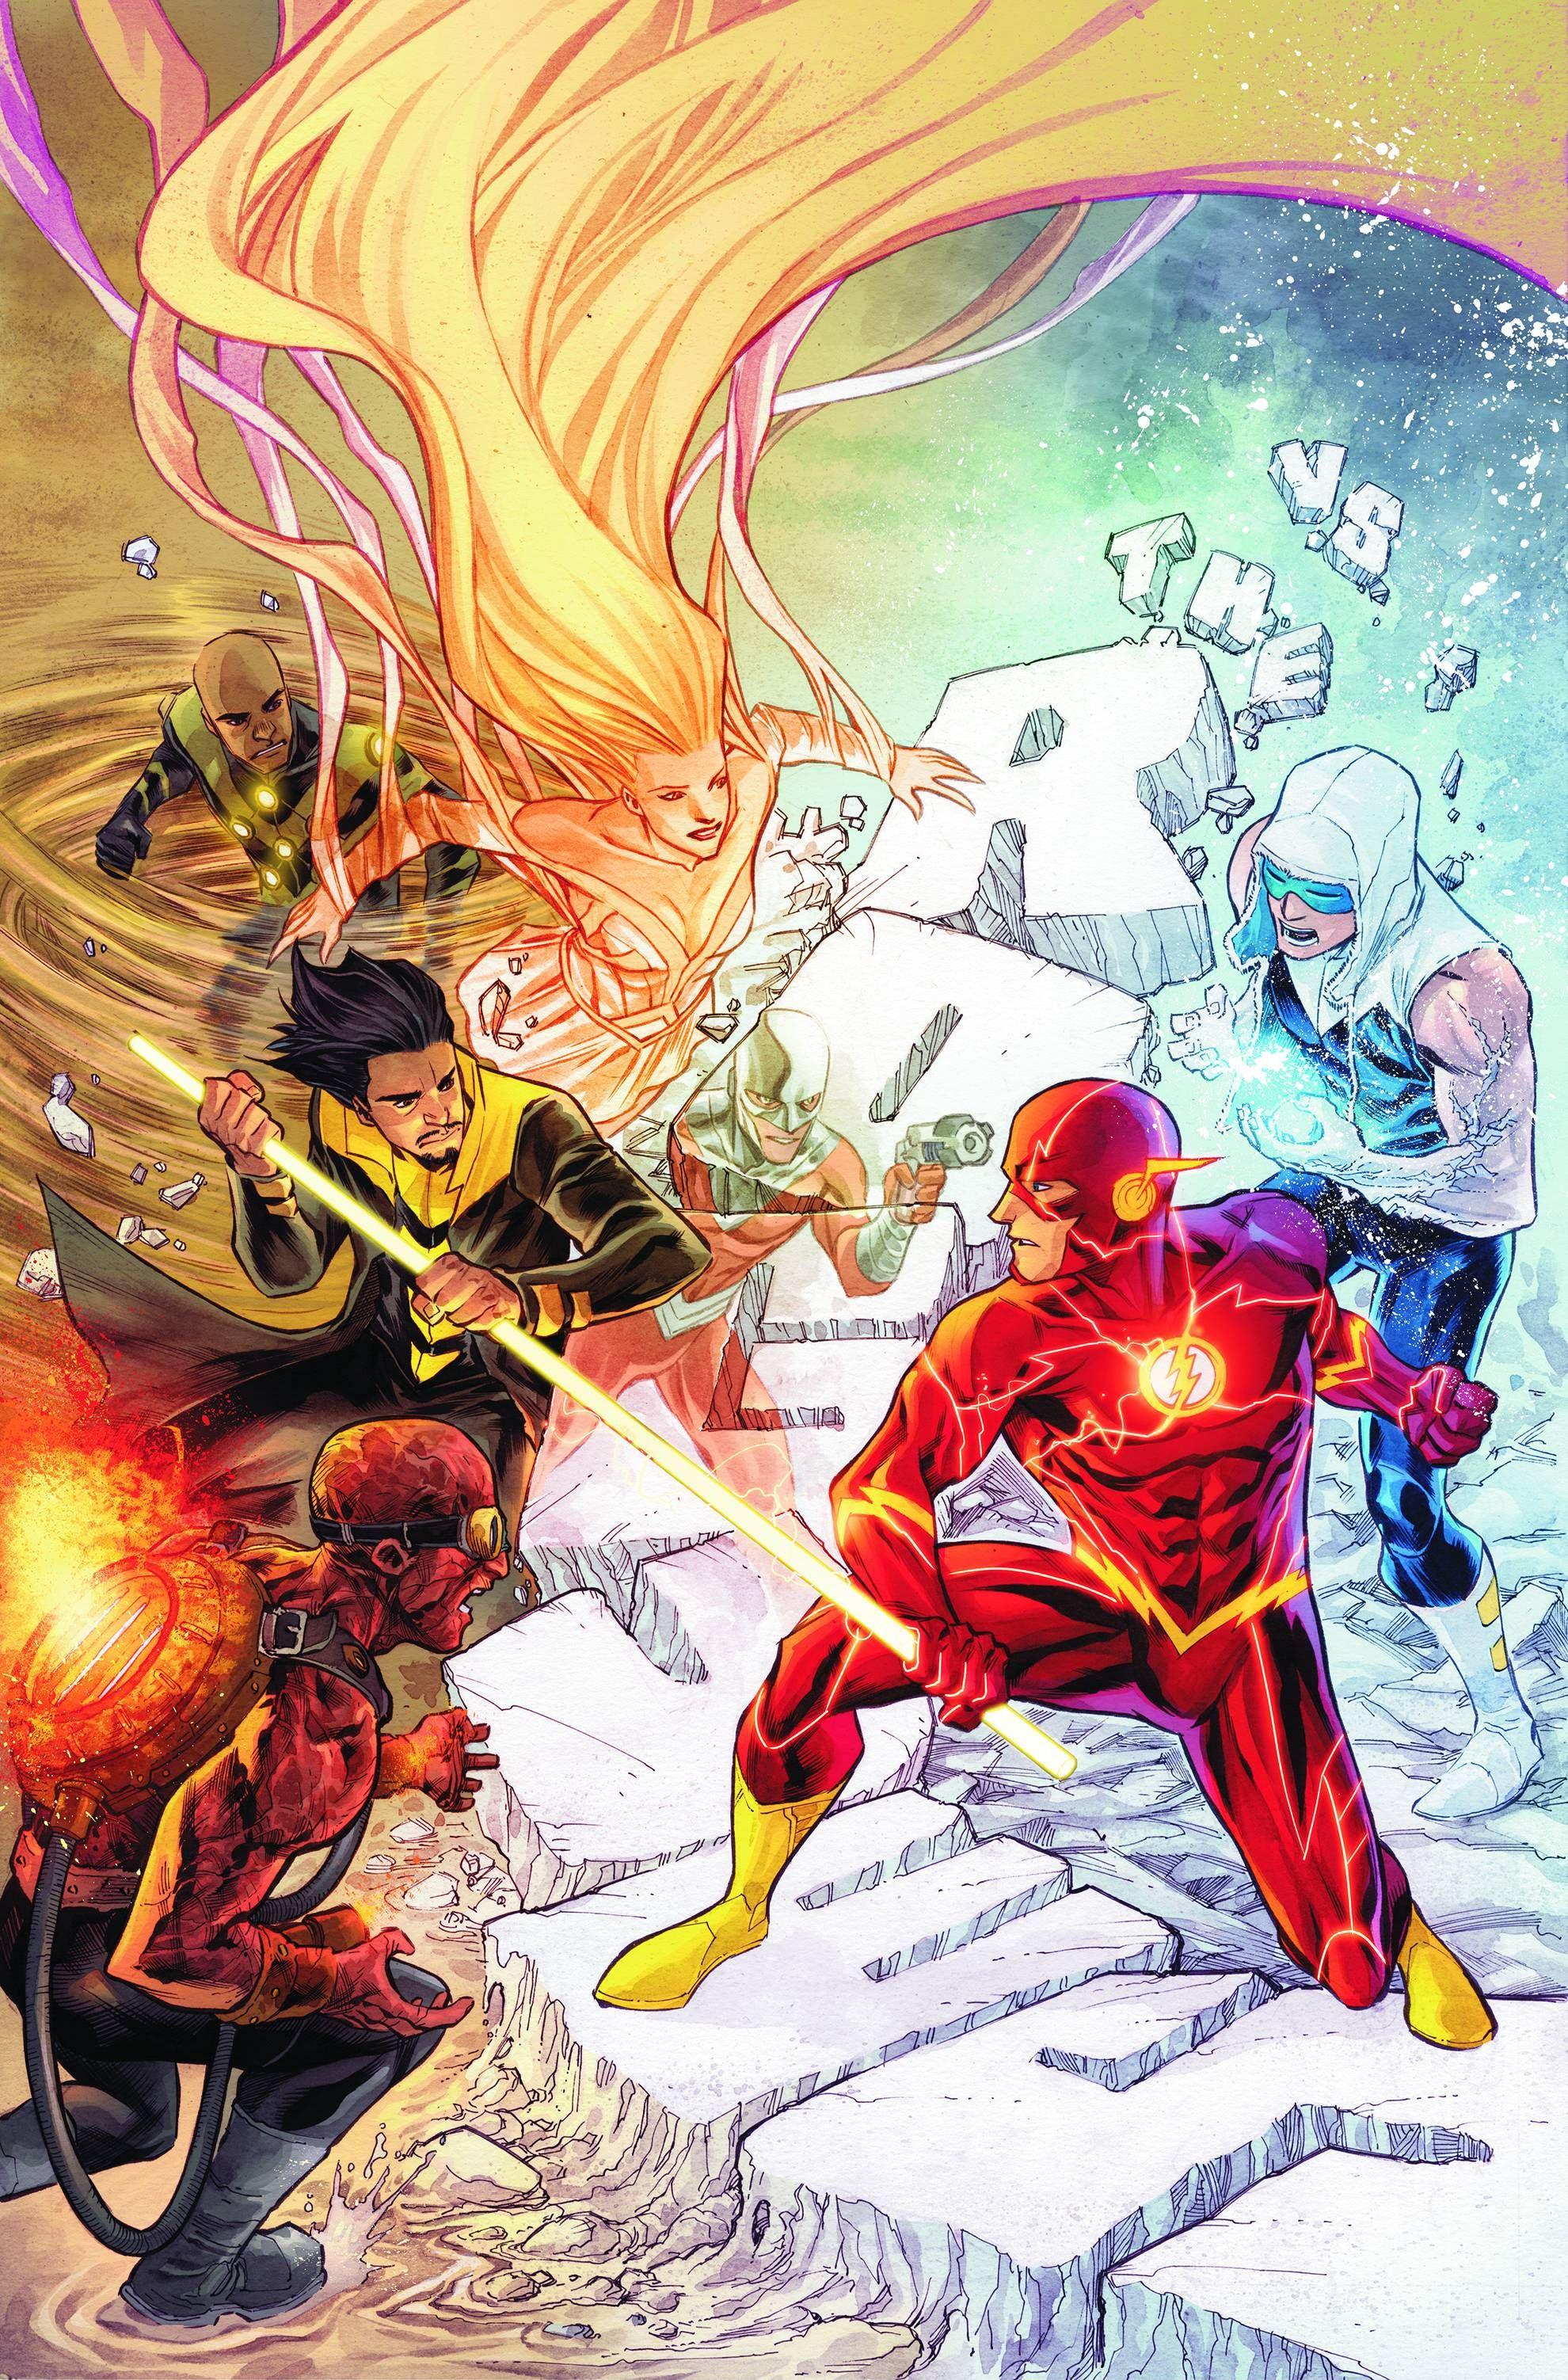 Flash Fan Art The Flash Annual 1 By Francis Manapul Awesomeness Aaa Flash Comics Flash Dc Comics The Flash